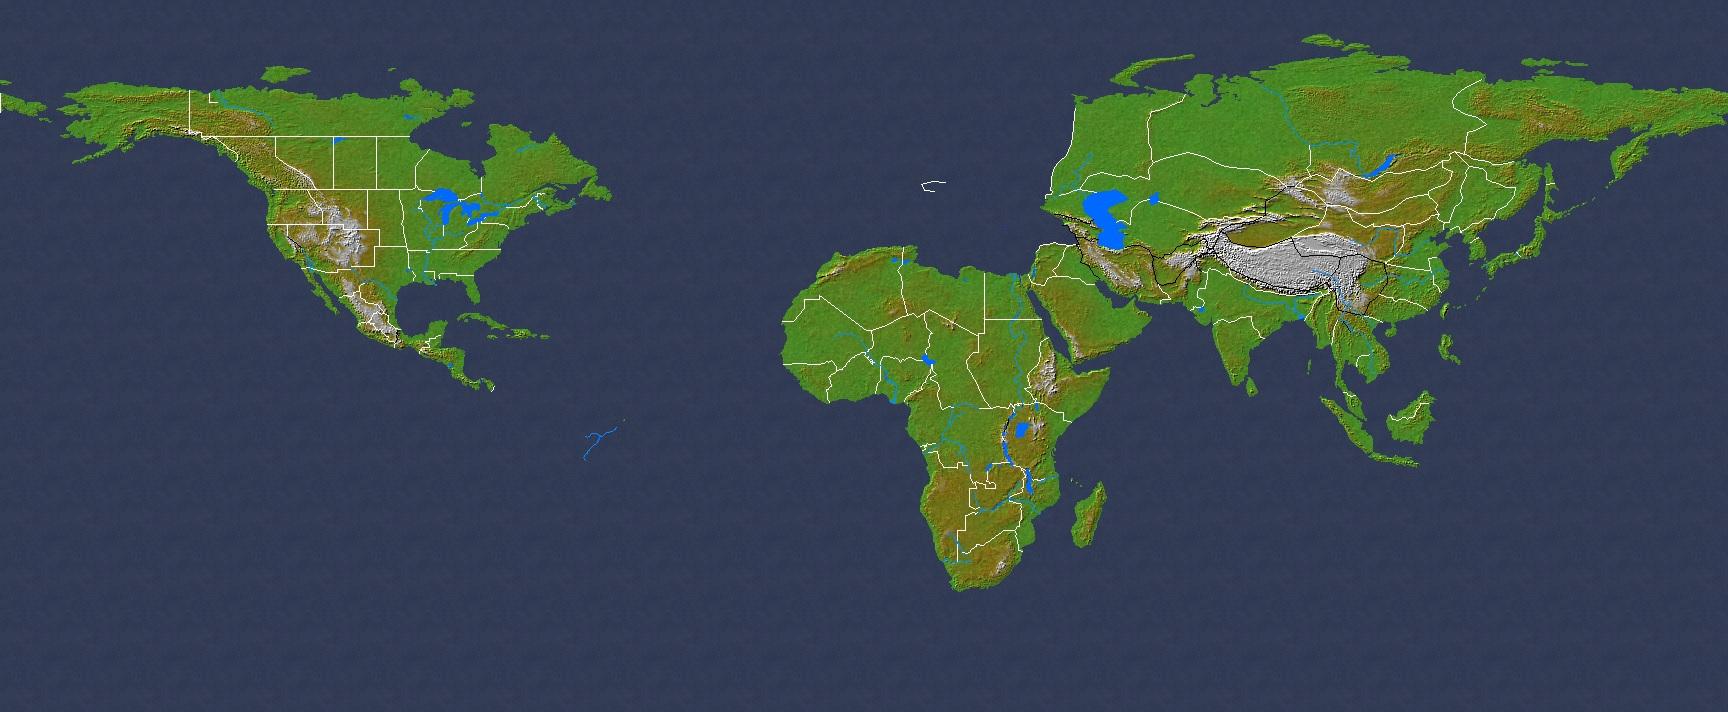 world6-1.jpg